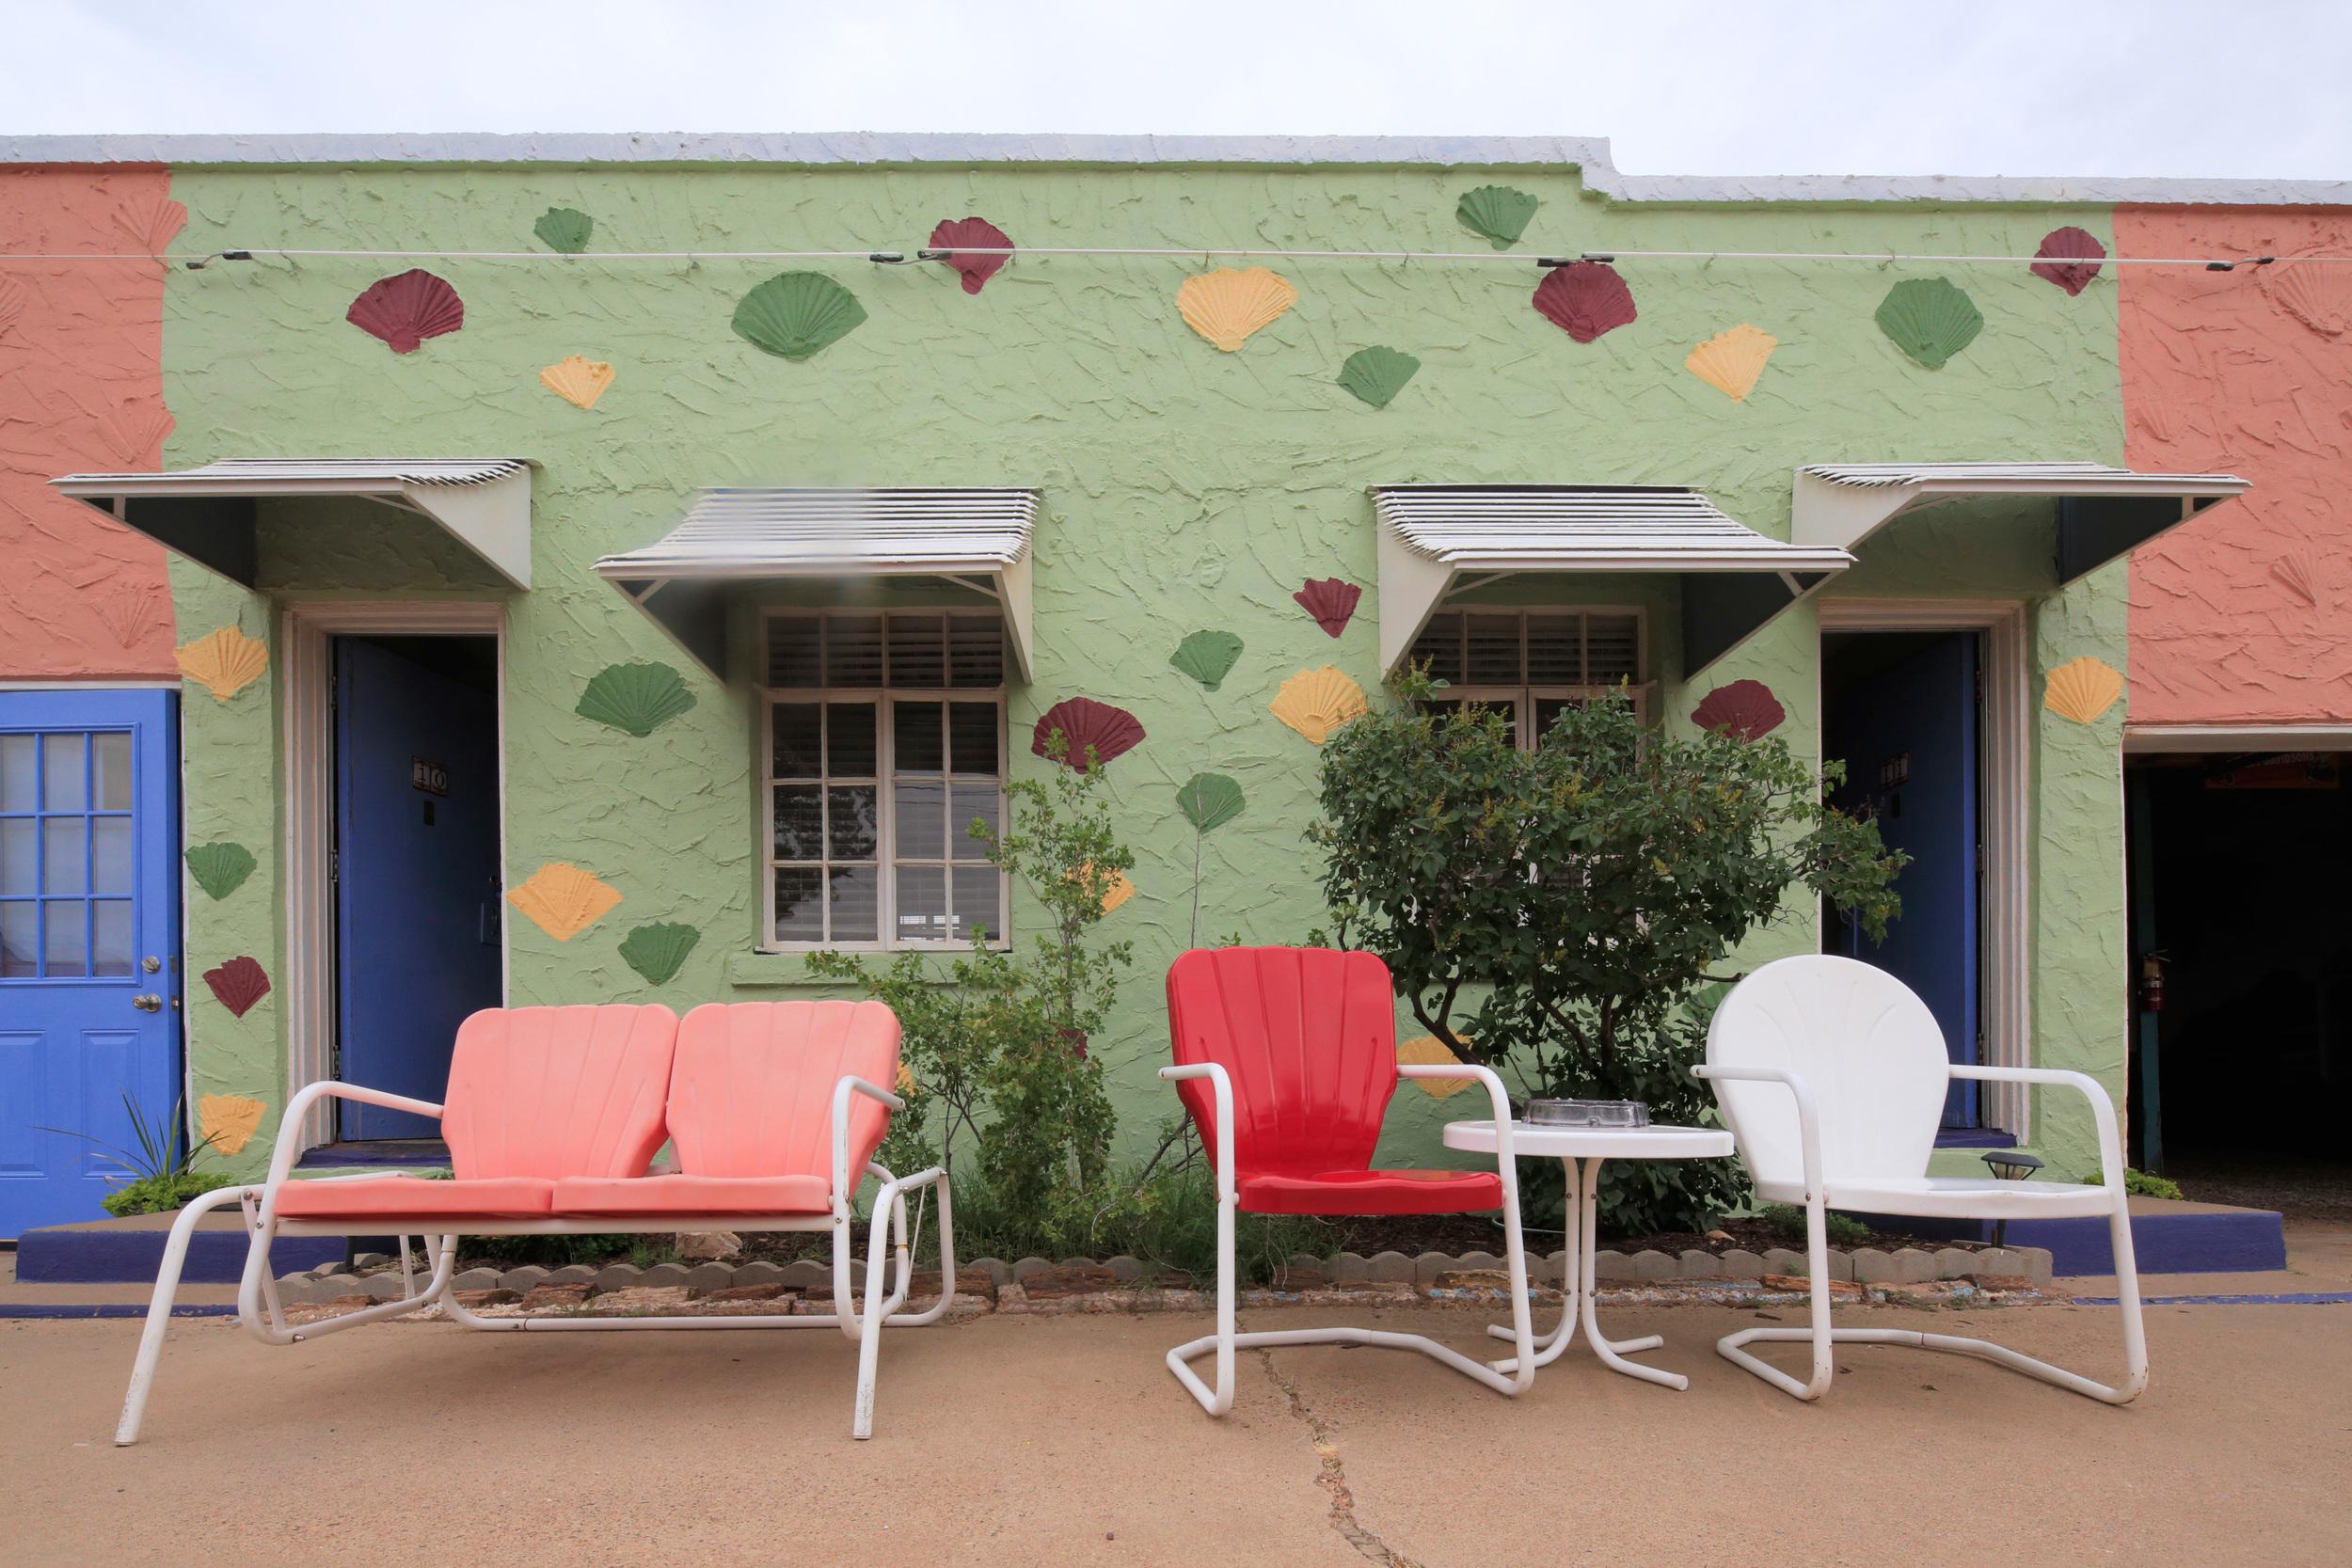 Blue Swallow Motel patio furniture